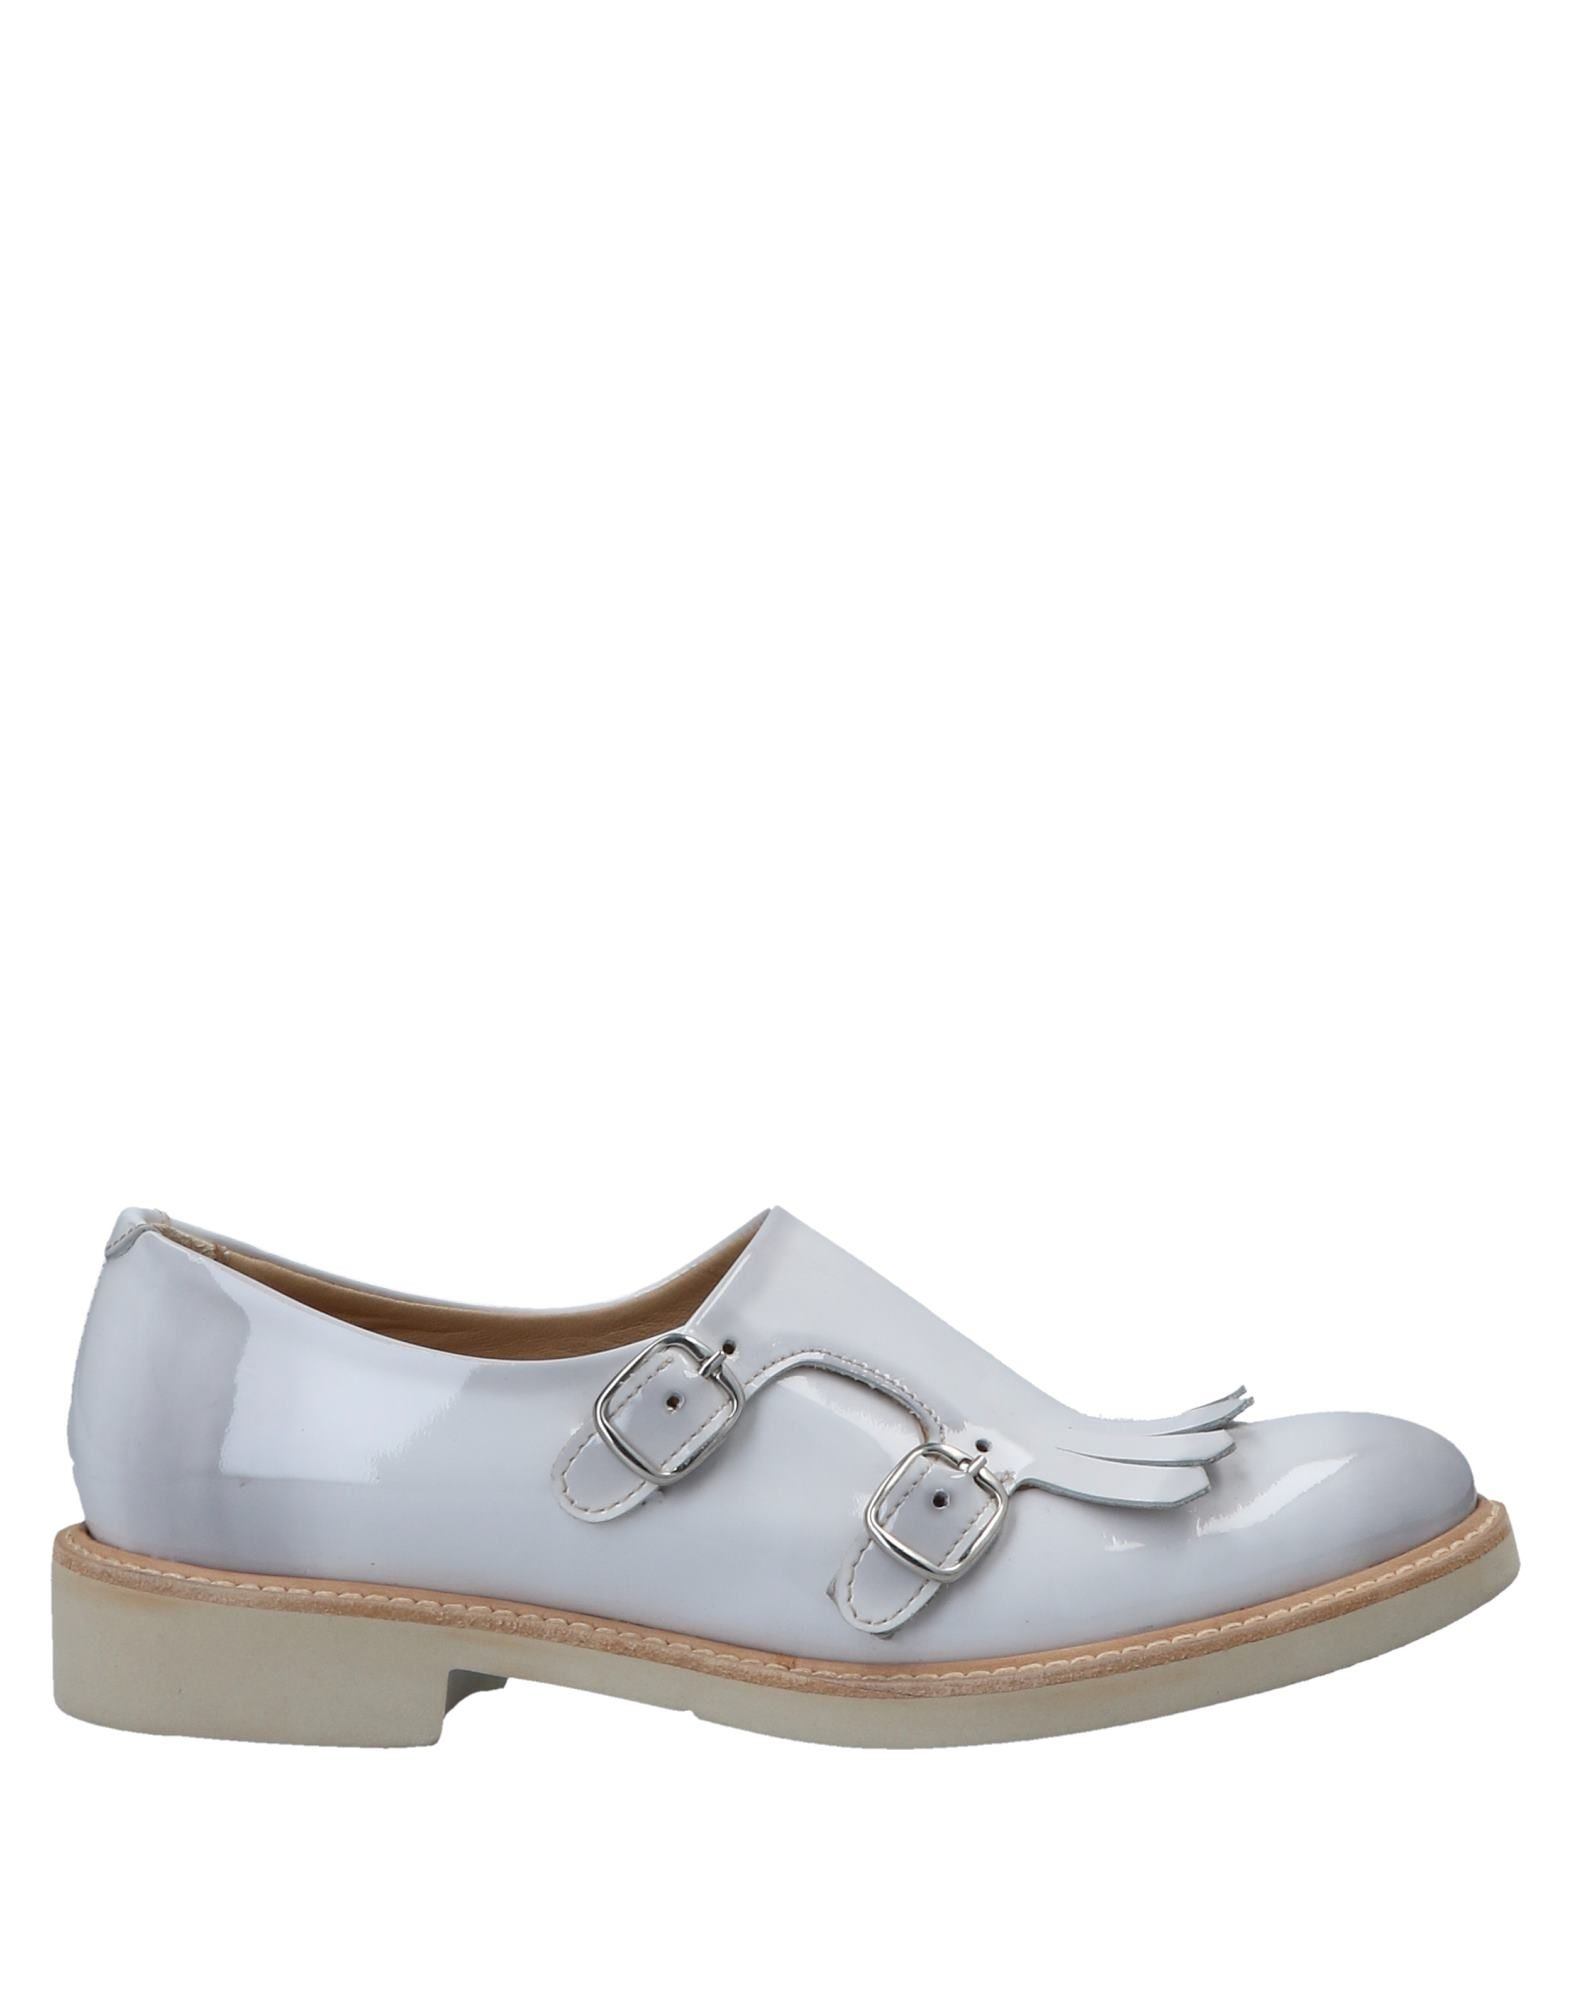 Calpierre Mokassins Damen  11551482HR Gute Qualität beliebte Schuhe